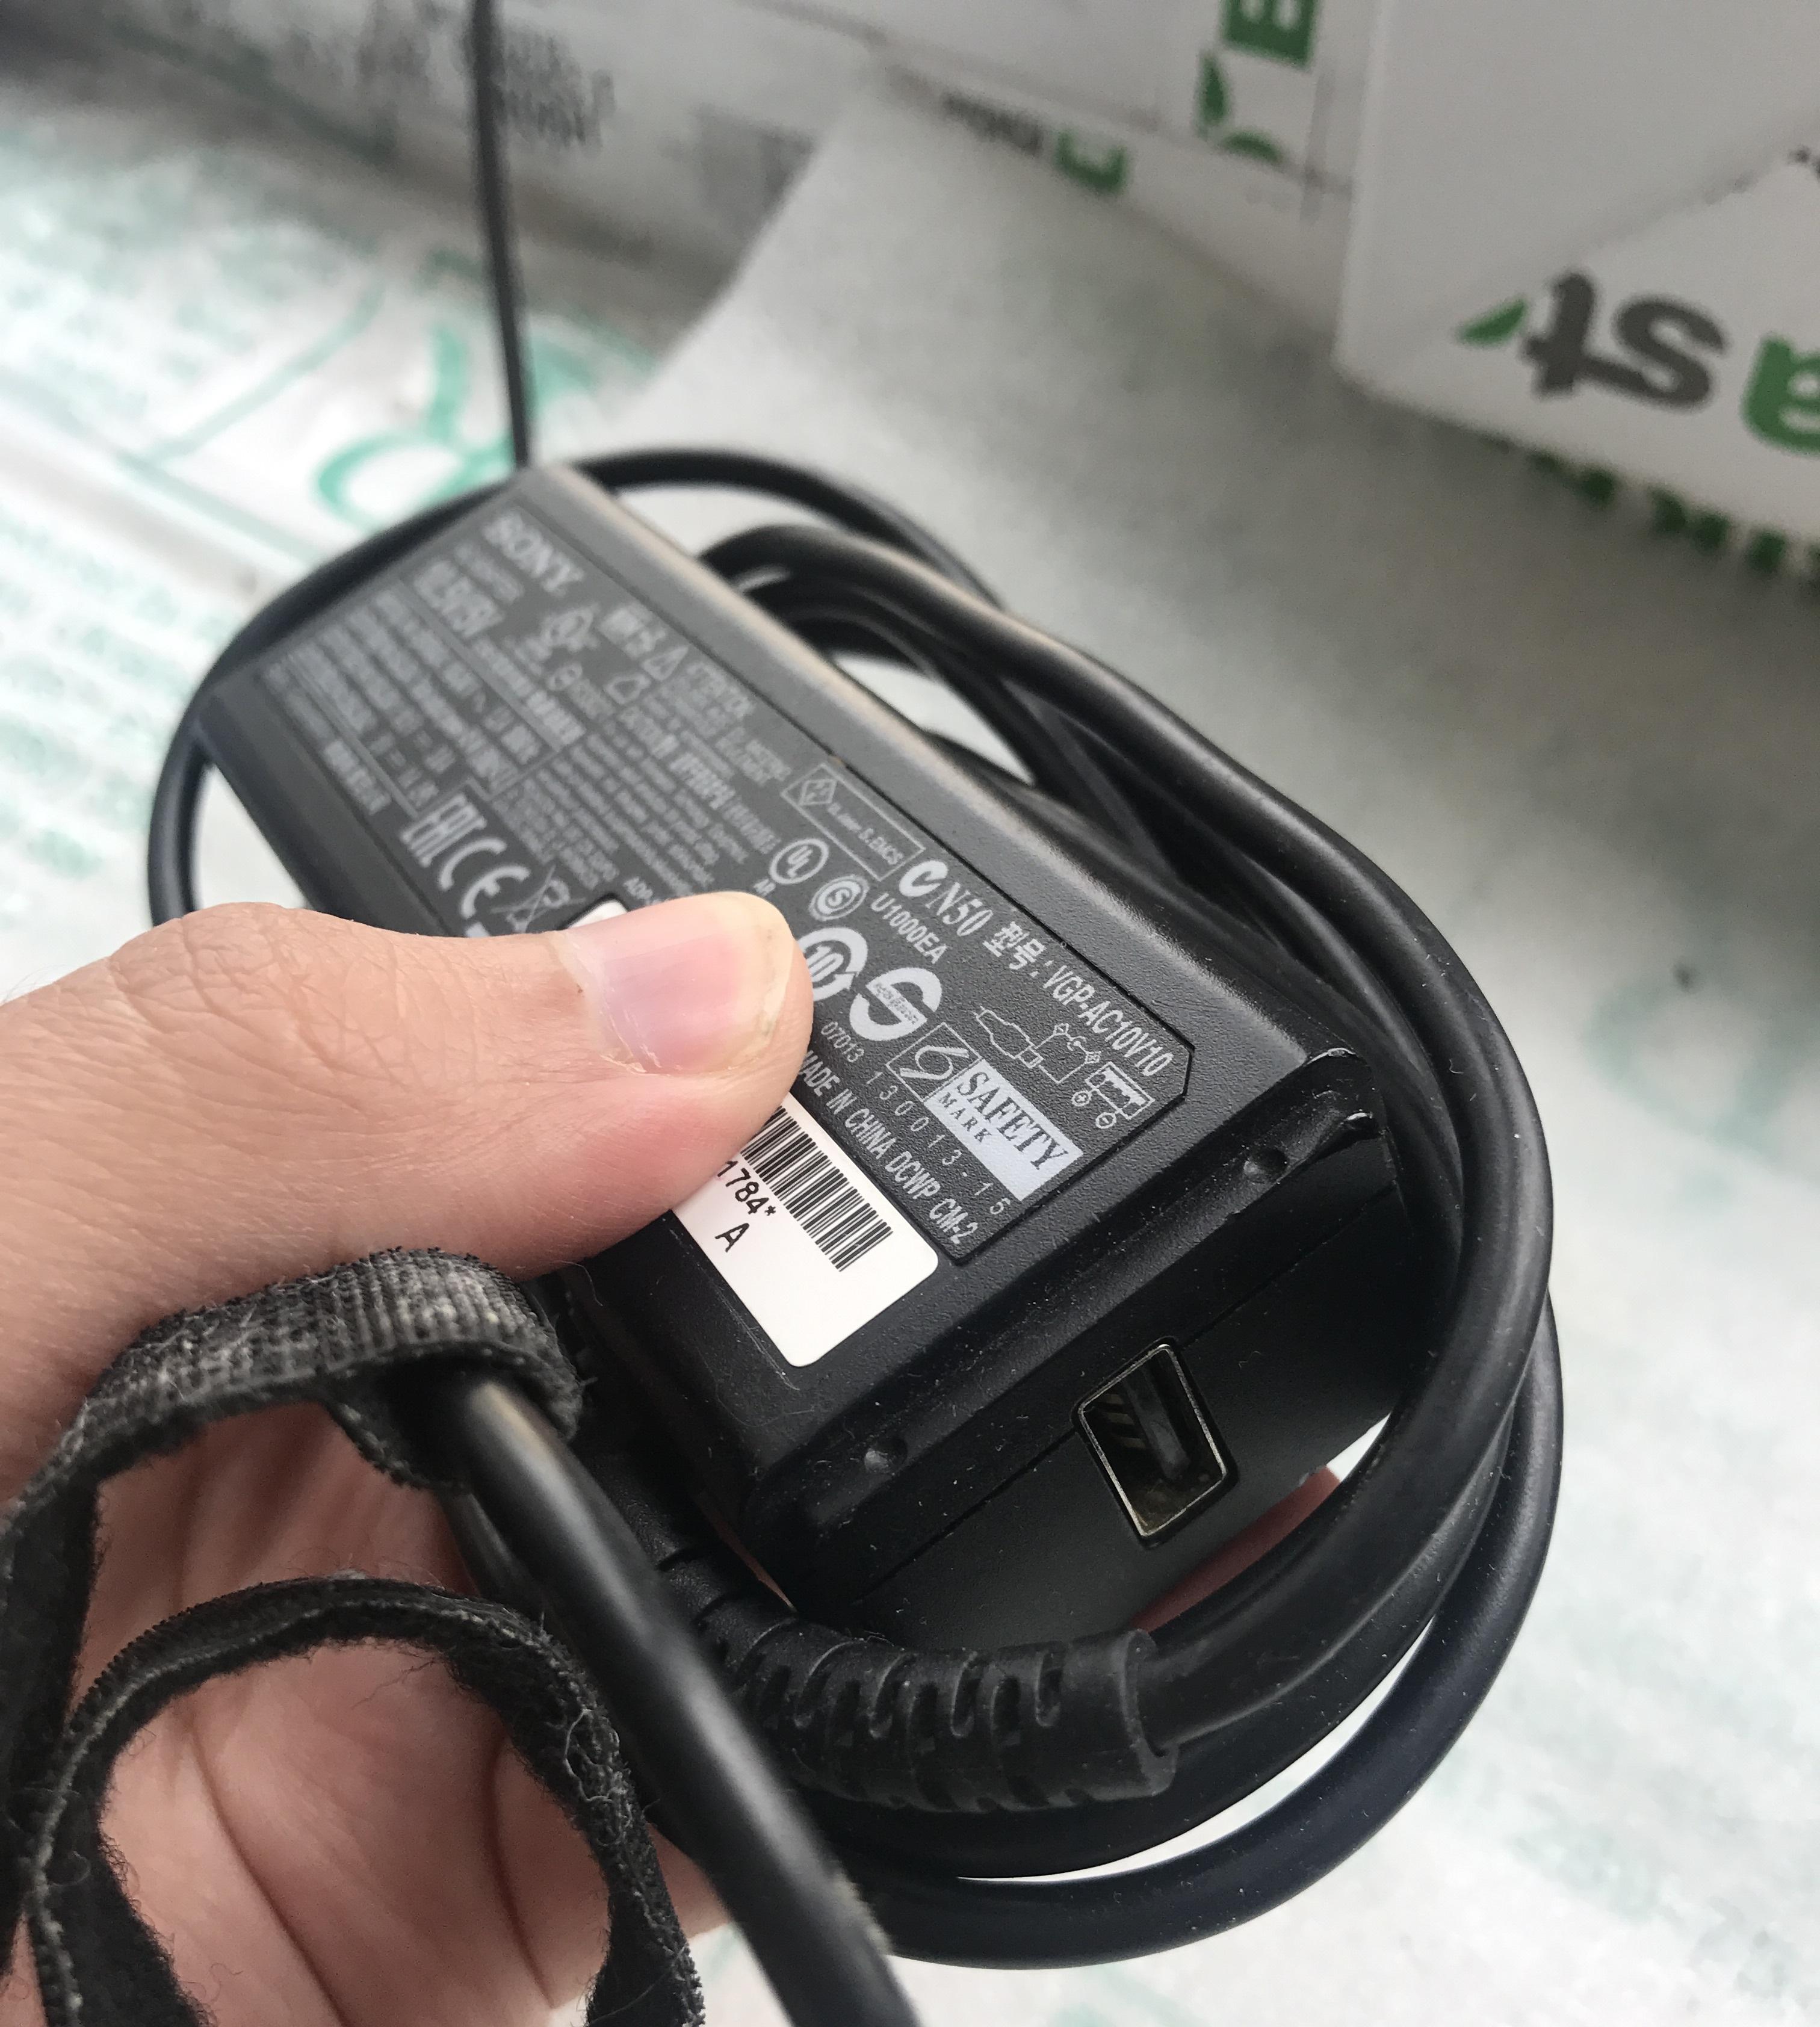 SONY VAIO CHARGER VGP-AC10V10